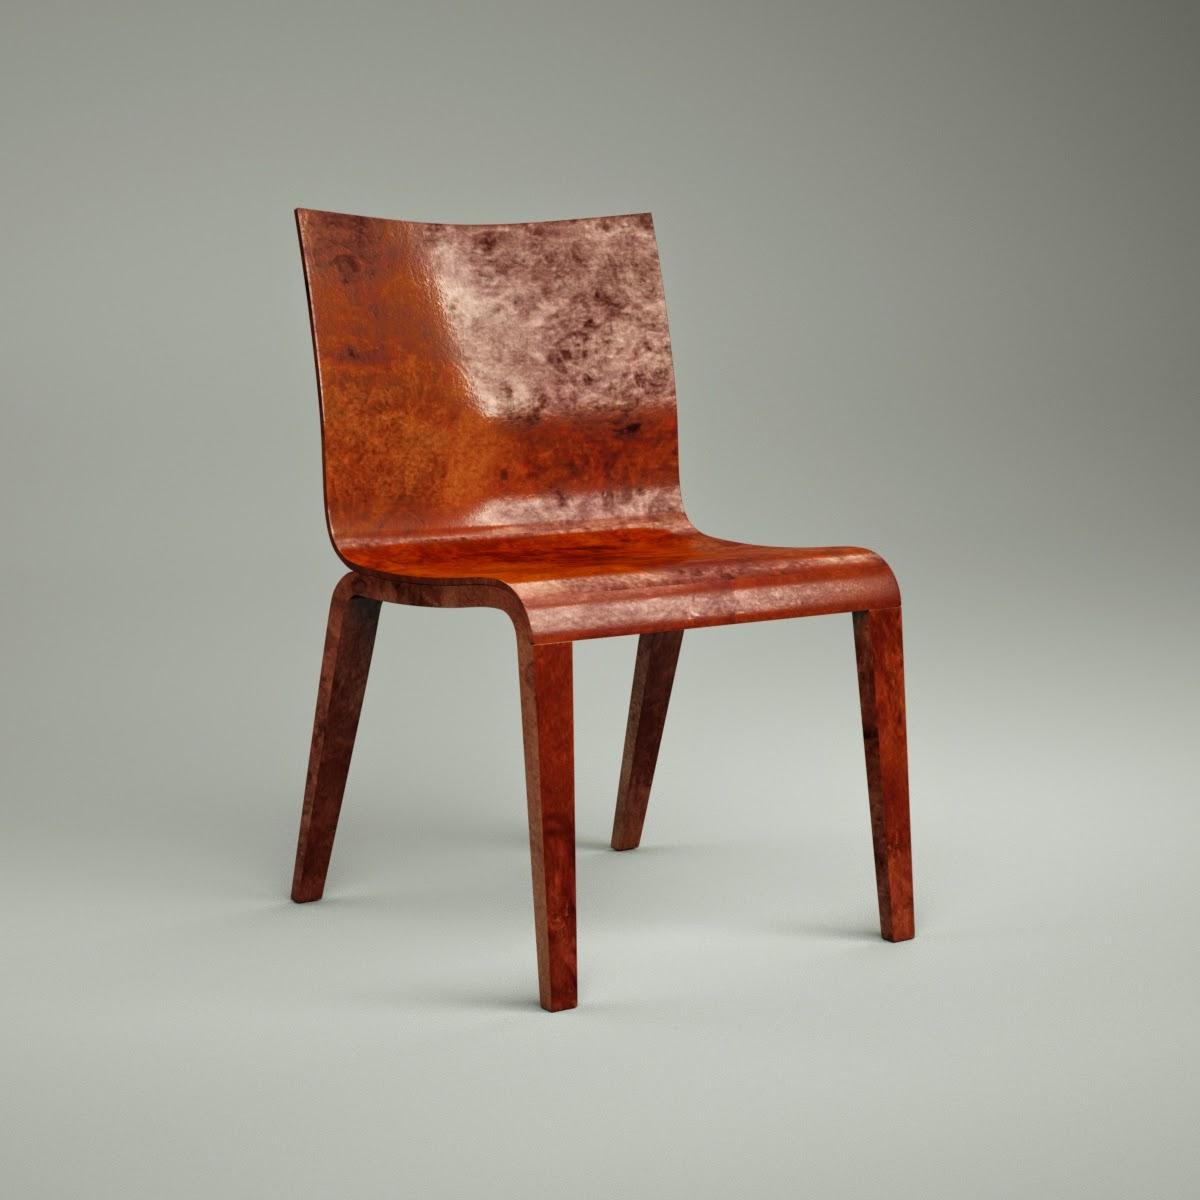 Simple Chair 3D Model Download fbx obj dxf blend